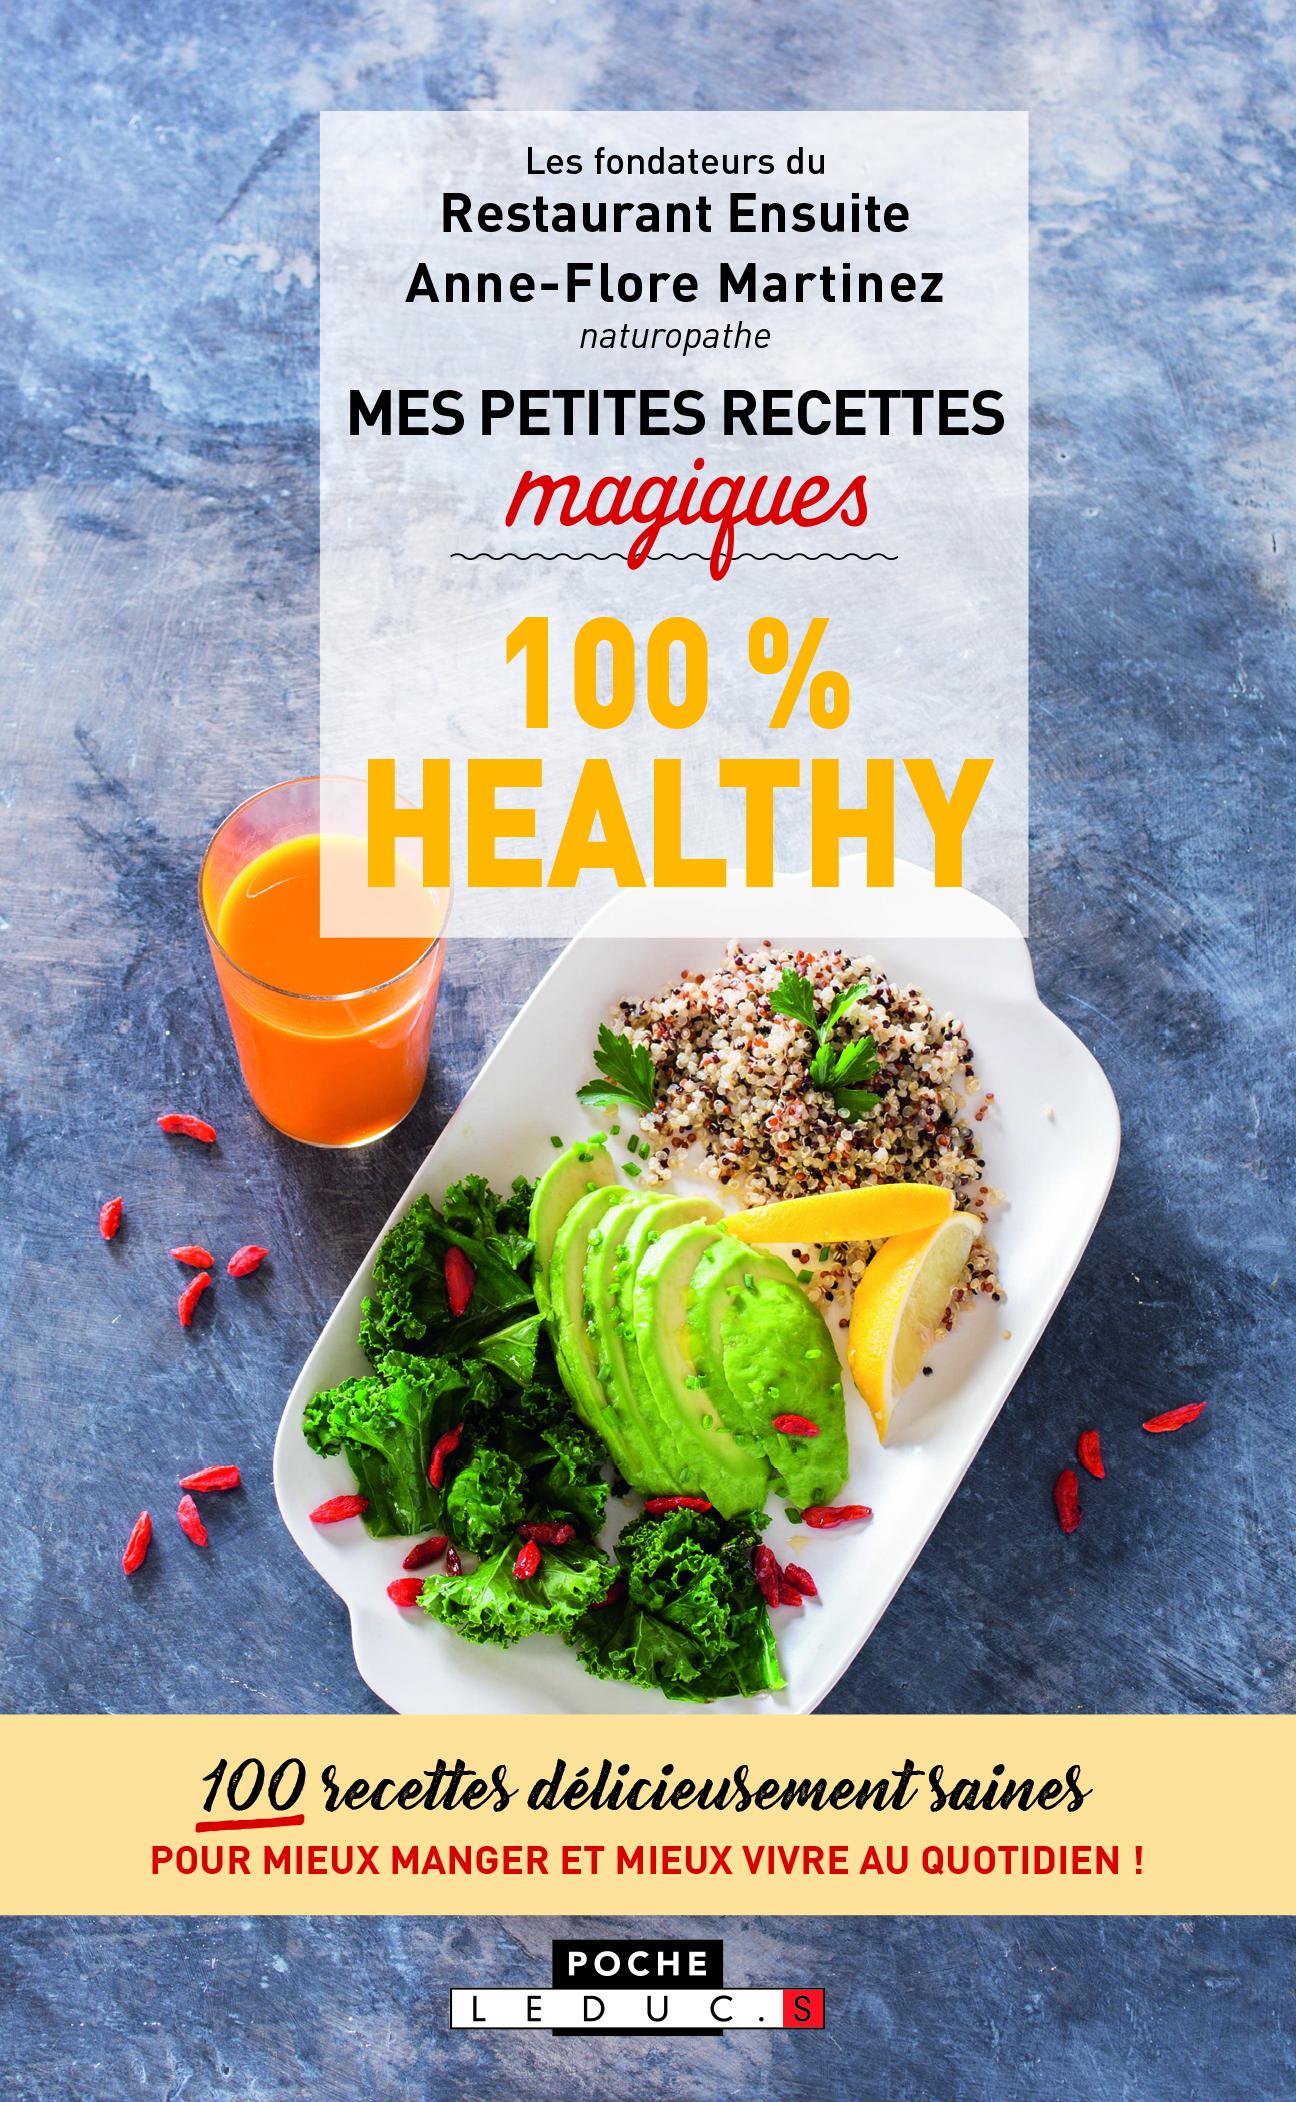 PETITES RECETTES MAGIQUES 100 % HEALTHY (MES)